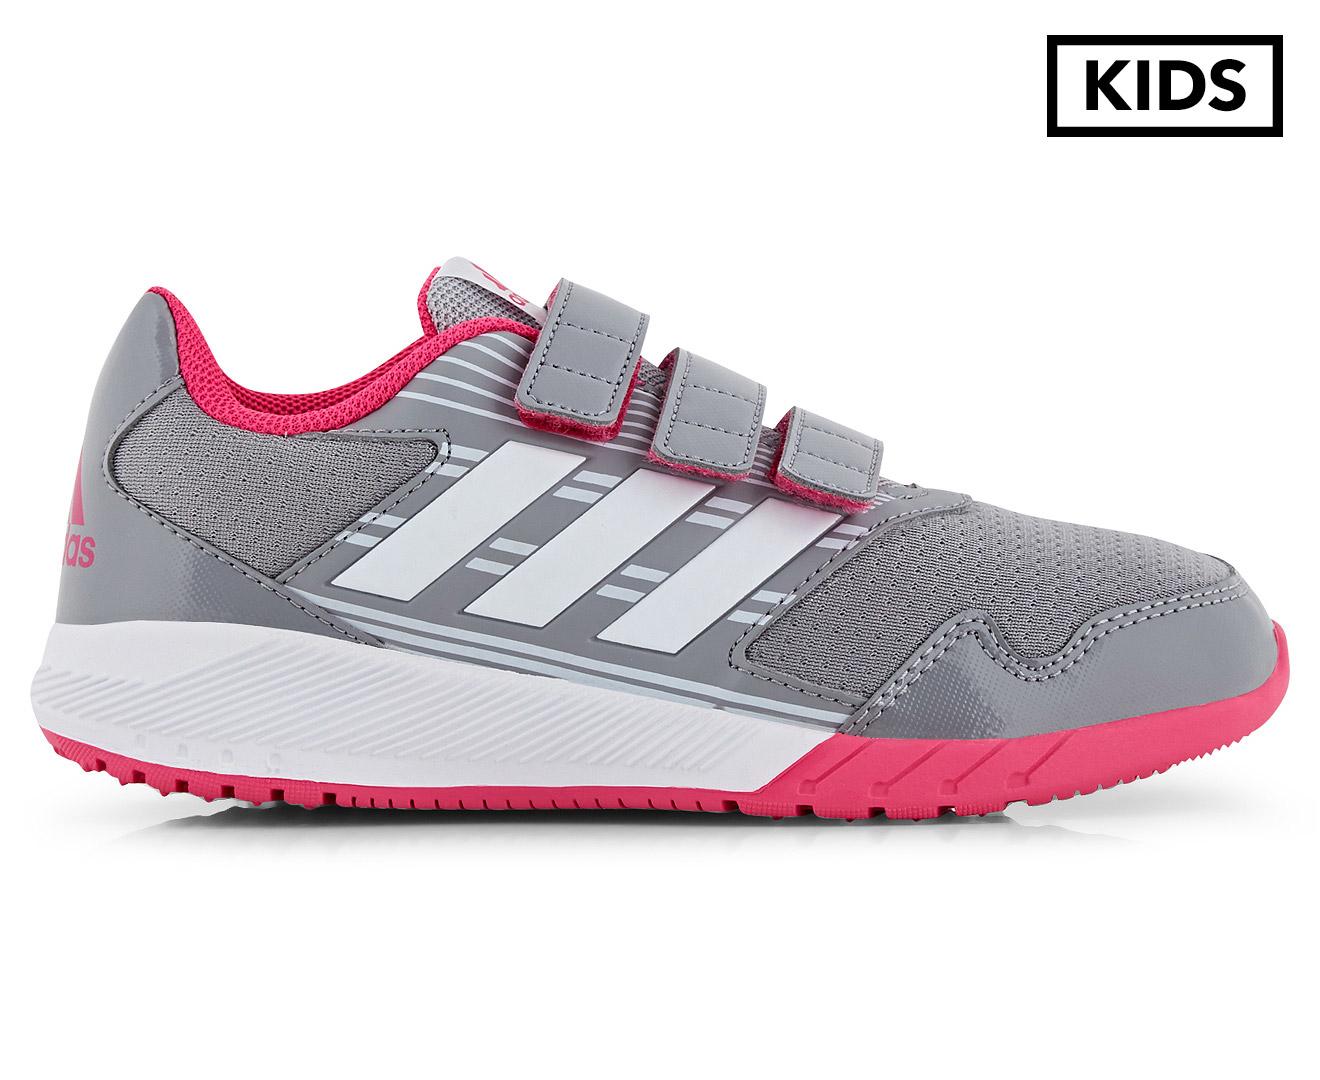 cheaper 02460 c9cbf Adidas Pre-School Girls AltaRun Shoe - Mid GreyWhiteShock Pink   Catch.com.au